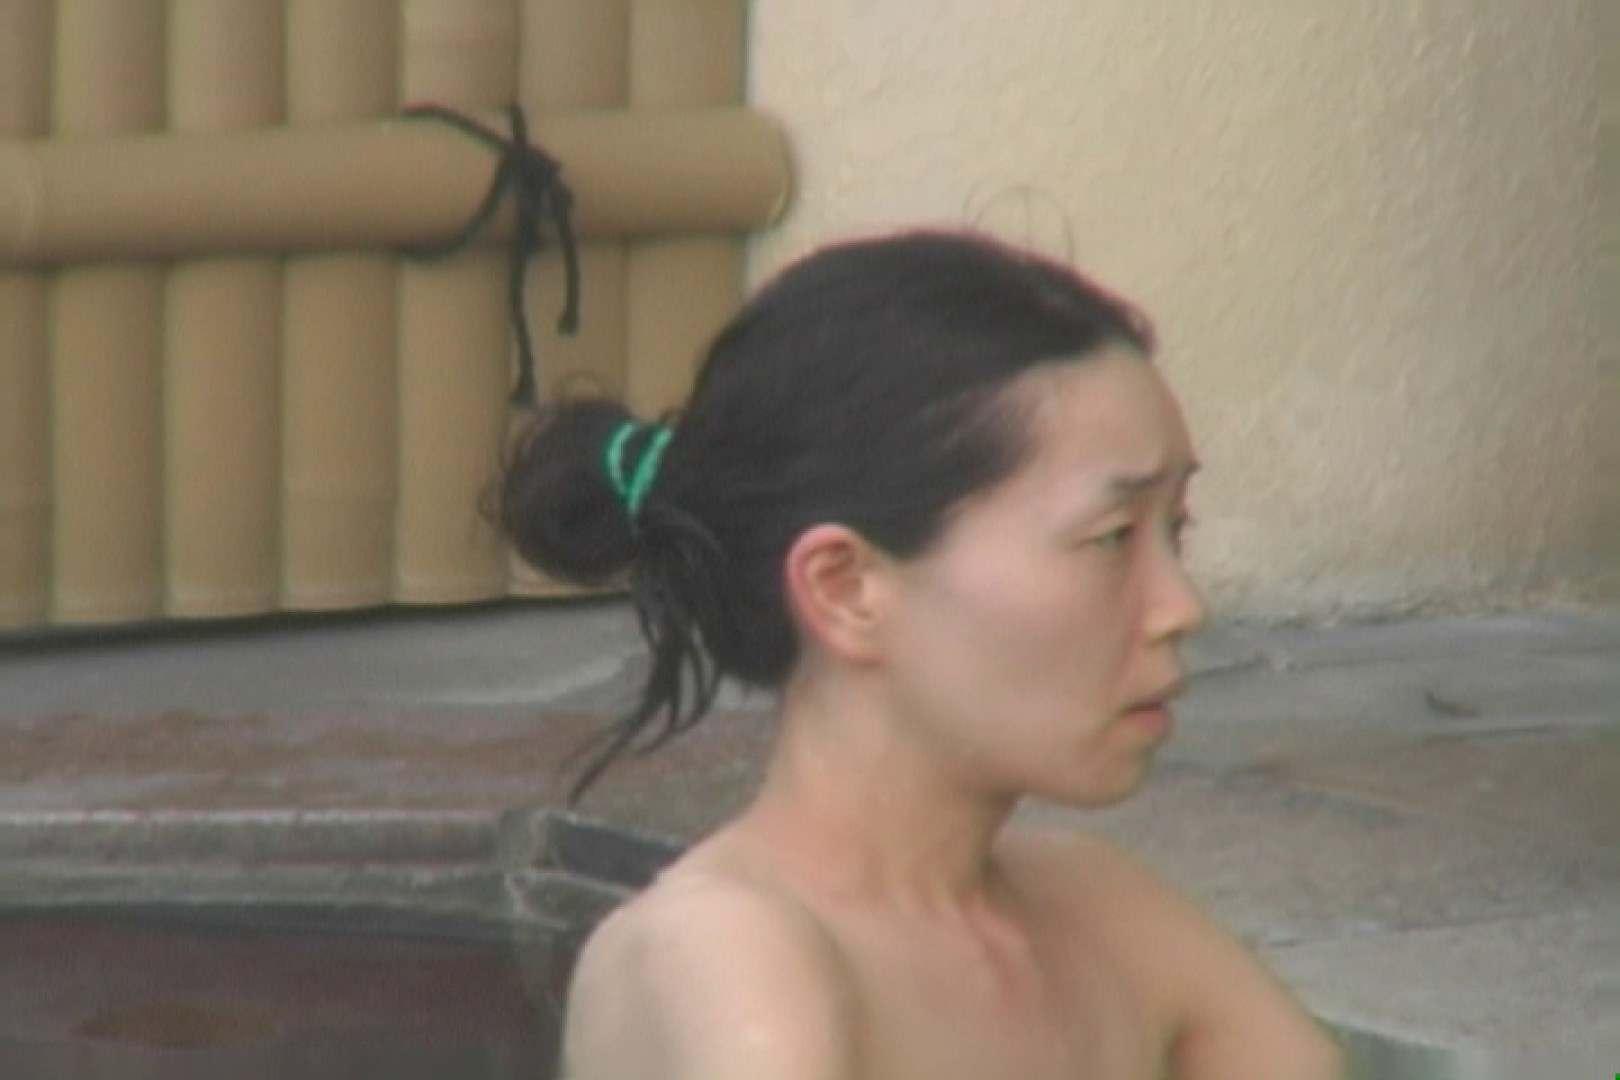 Aquaな露天風呂Vol.577 OLのプライベート オメコ動画キャプチャ 12pic 5